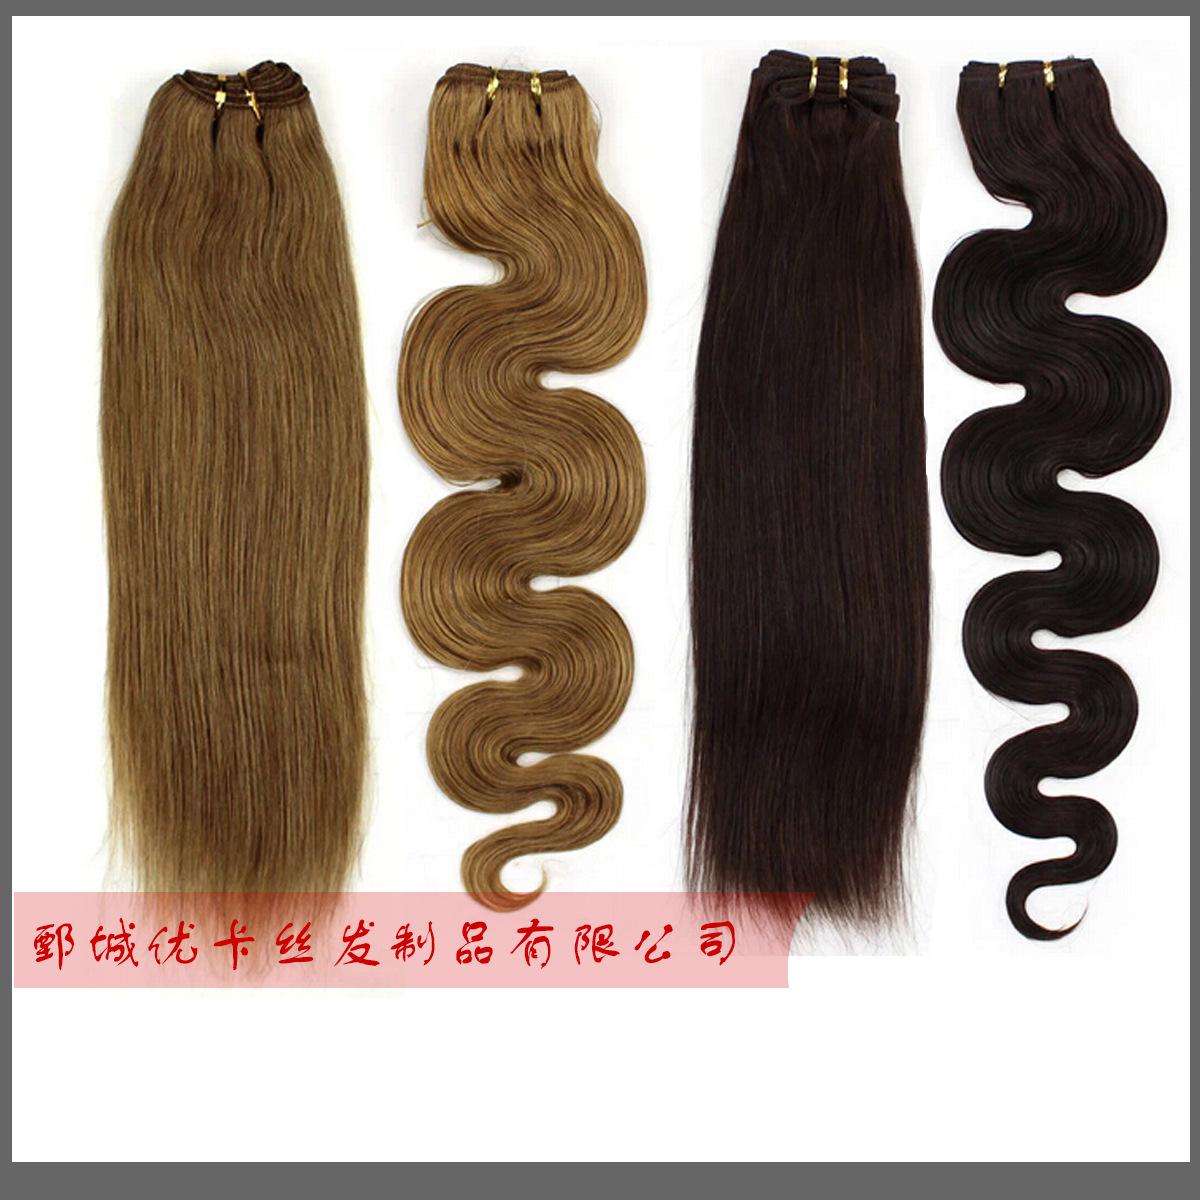 Гаджет  Manufacturers selling hair hair hair curtain curtain curvature wigs of export products None Промышленность и бизнес